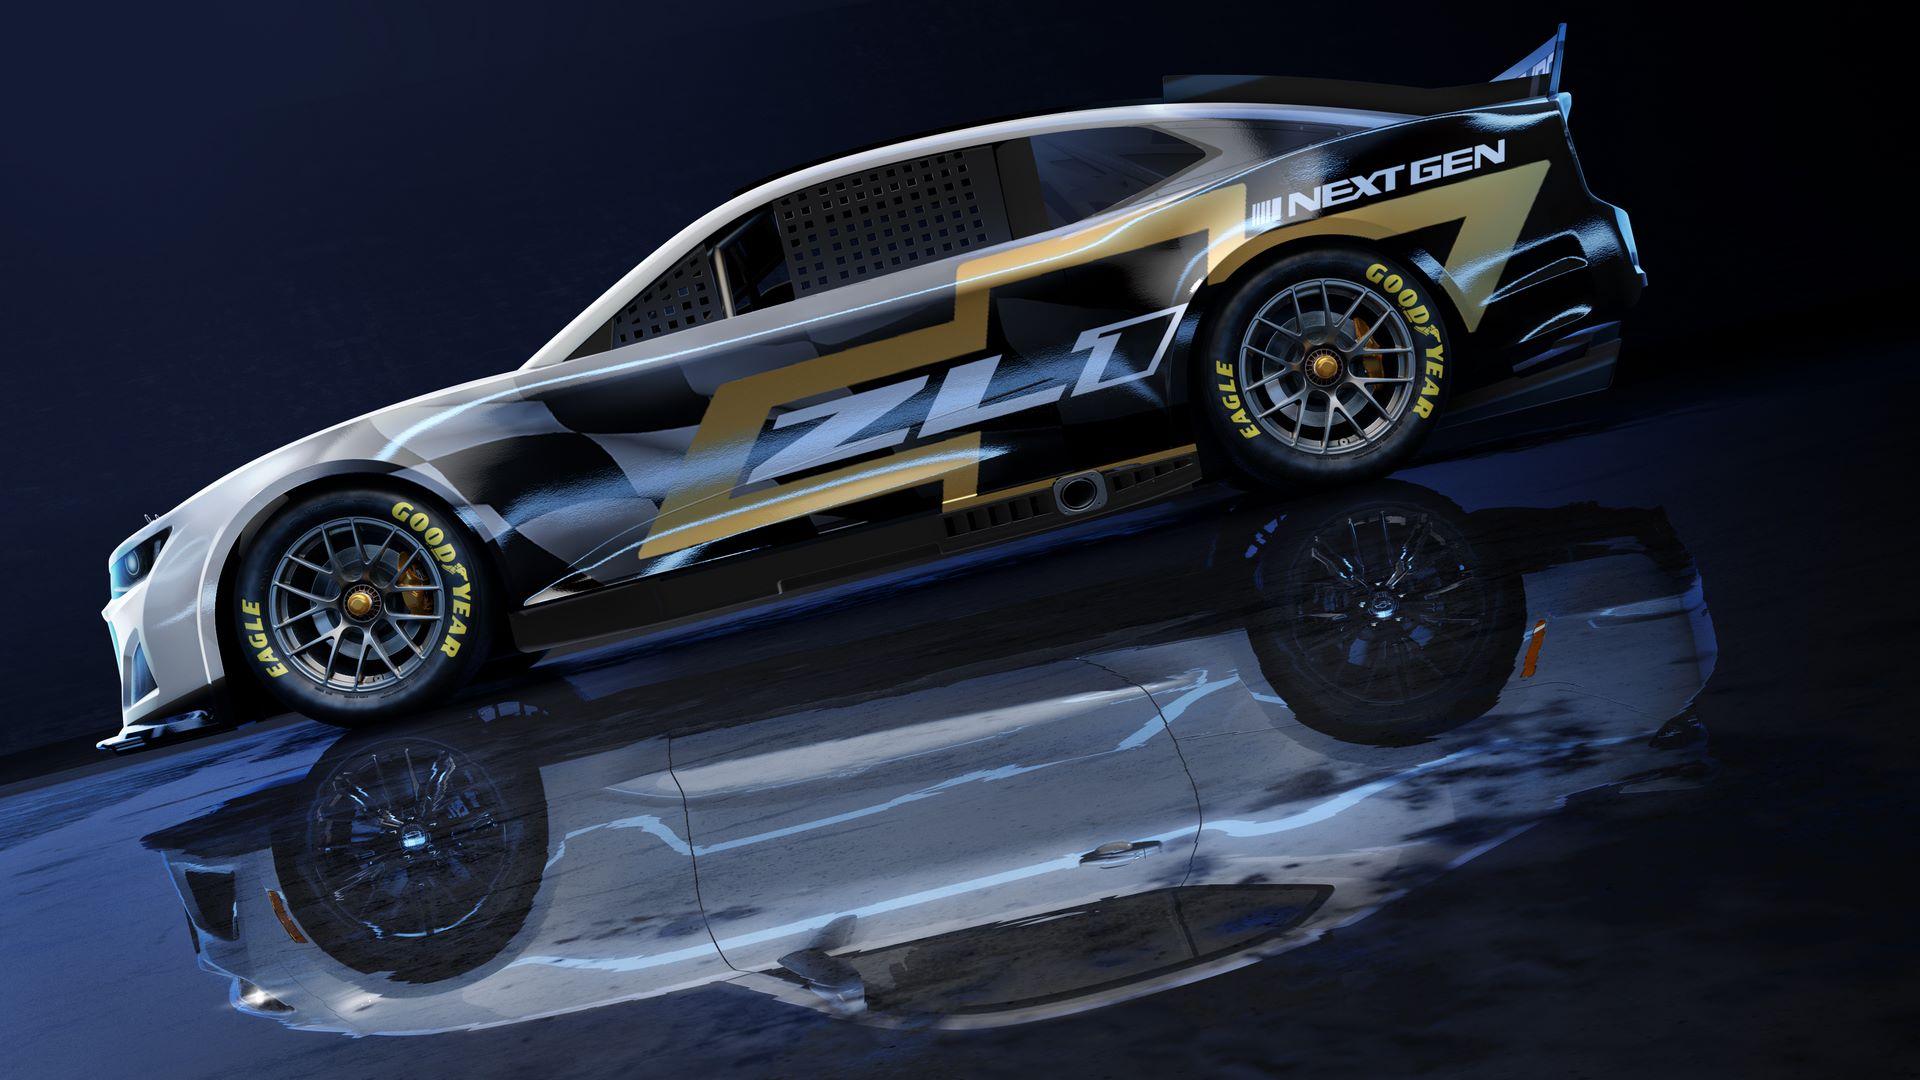 Chevrolet-Camaro-ZL1-RaceCarr-Next-Gen-Nascar-7